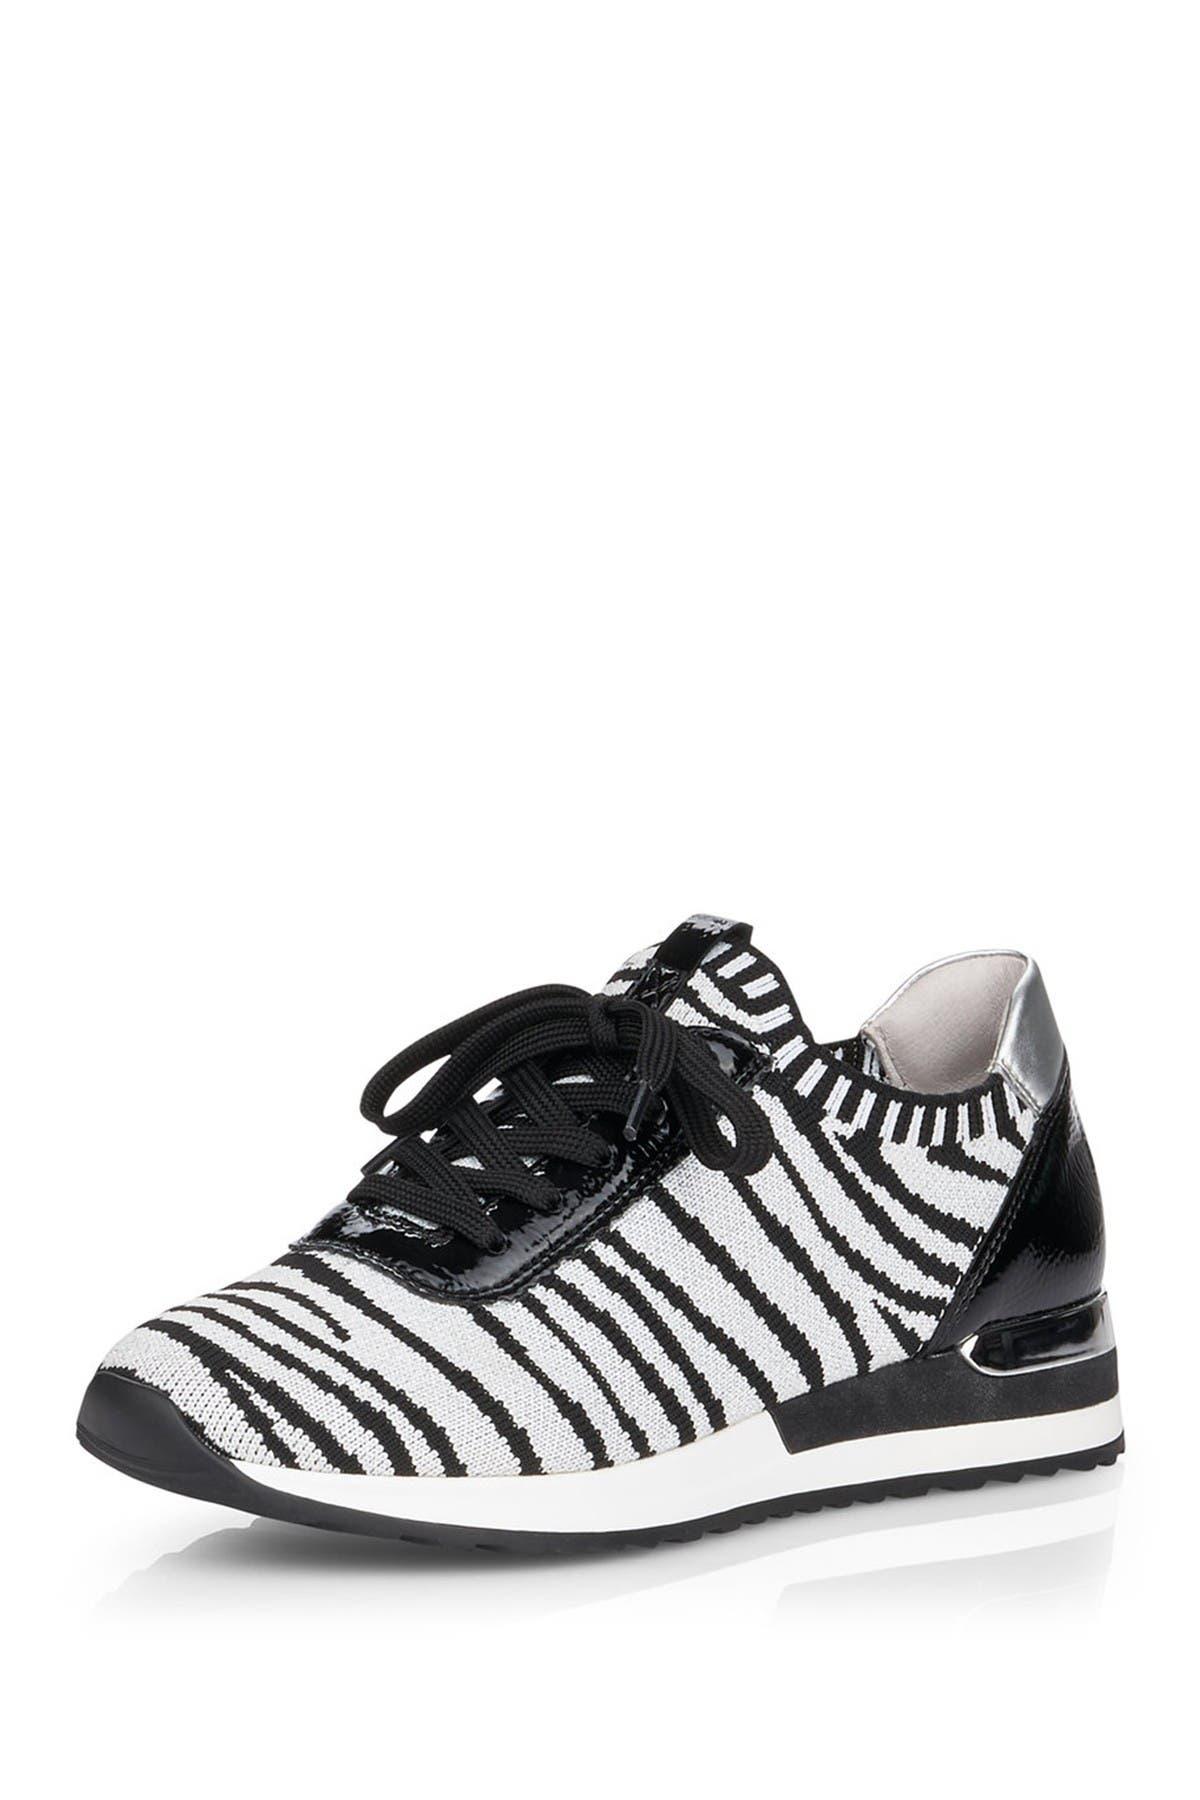 Image of Remonte Elmira Animal Print Knit Sneaker